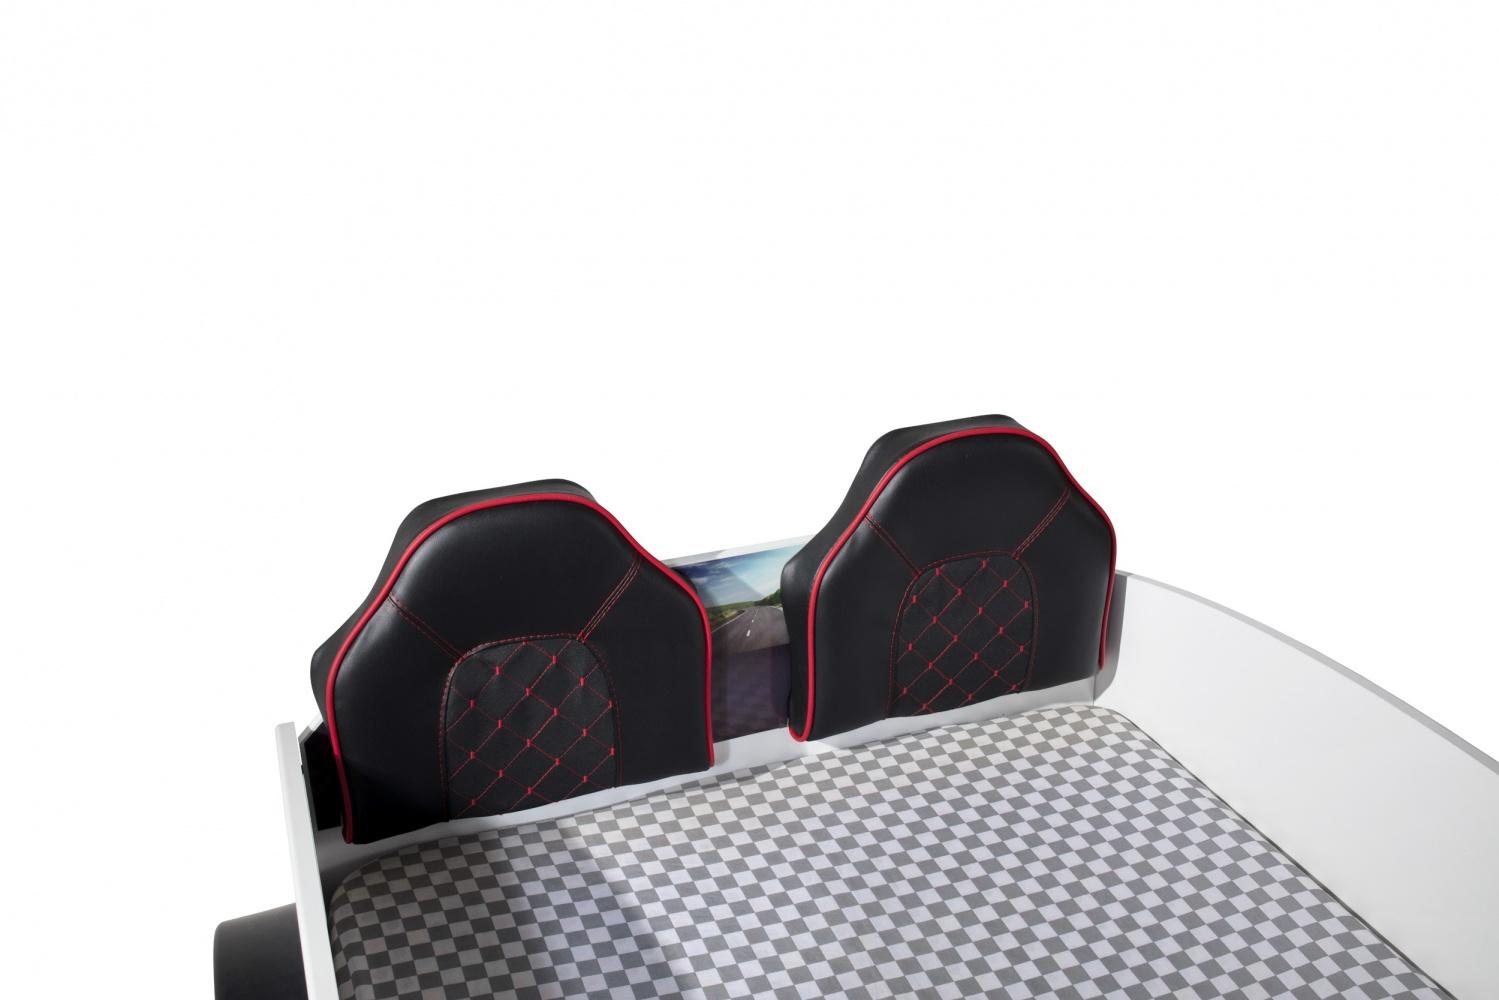 Autobettzimmer komplett SPX Grand Prix 5-Teilig Weiß